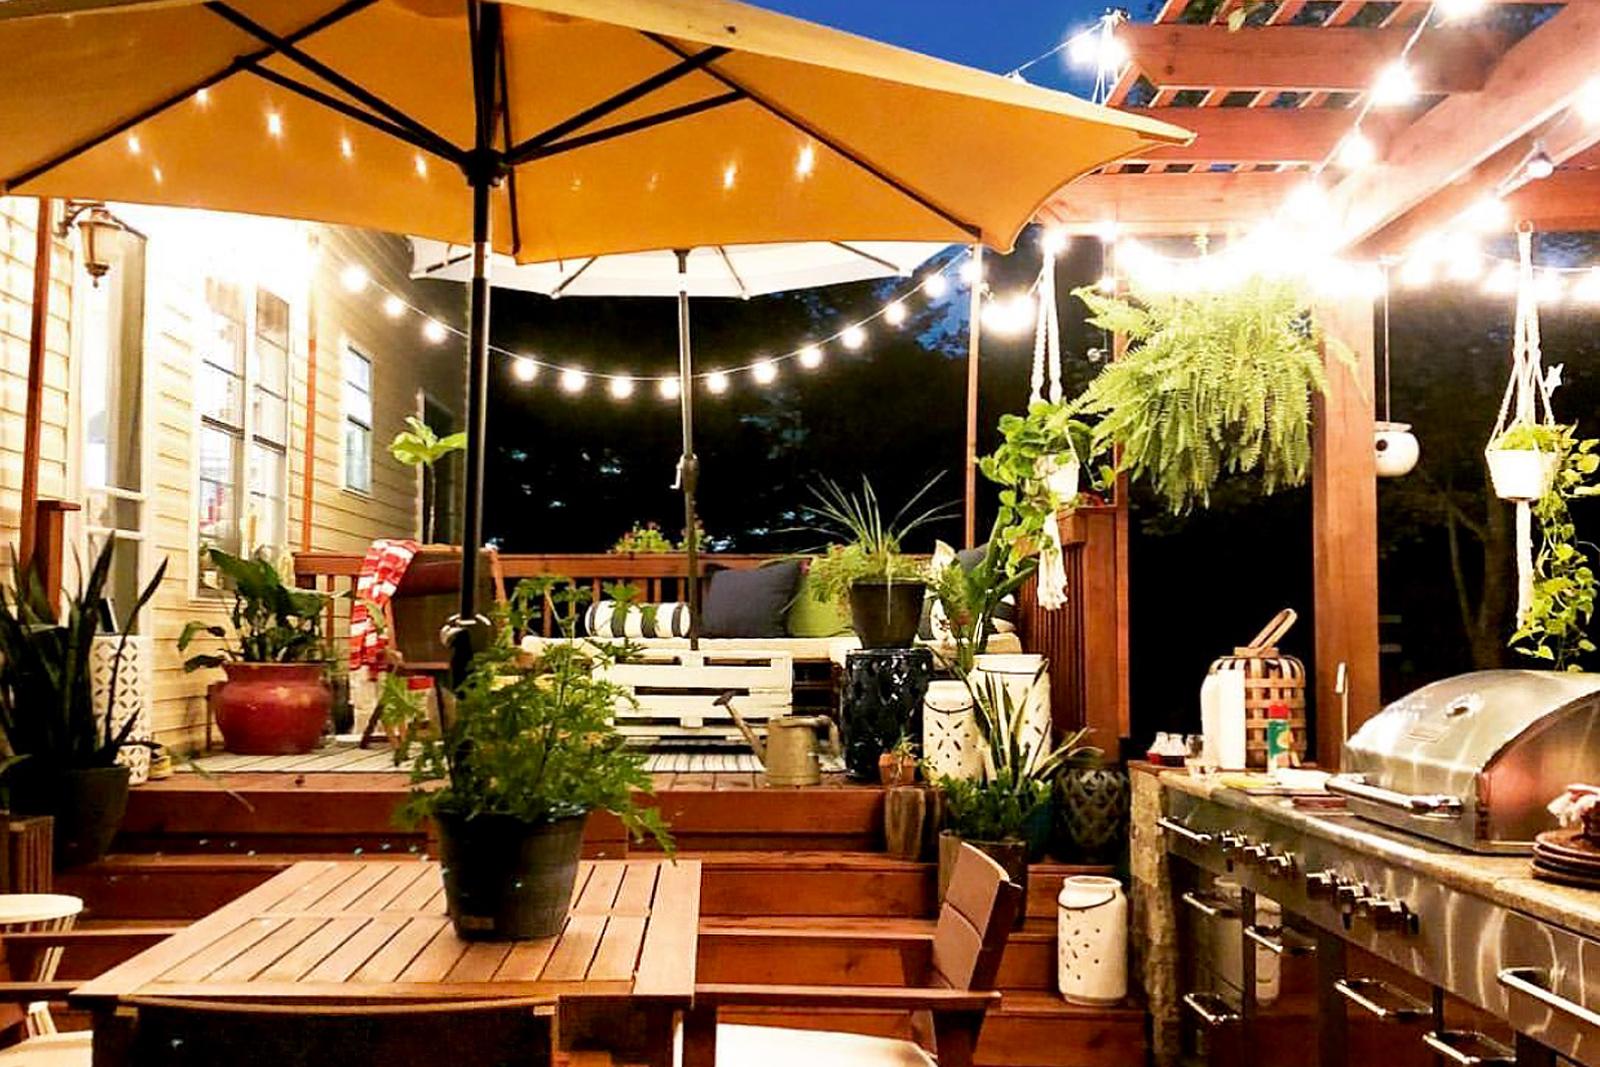 Outdoor Kitchen | Building an Outdoor Kitchen | HouseLogic on Backyard Kitchen Design id=94617